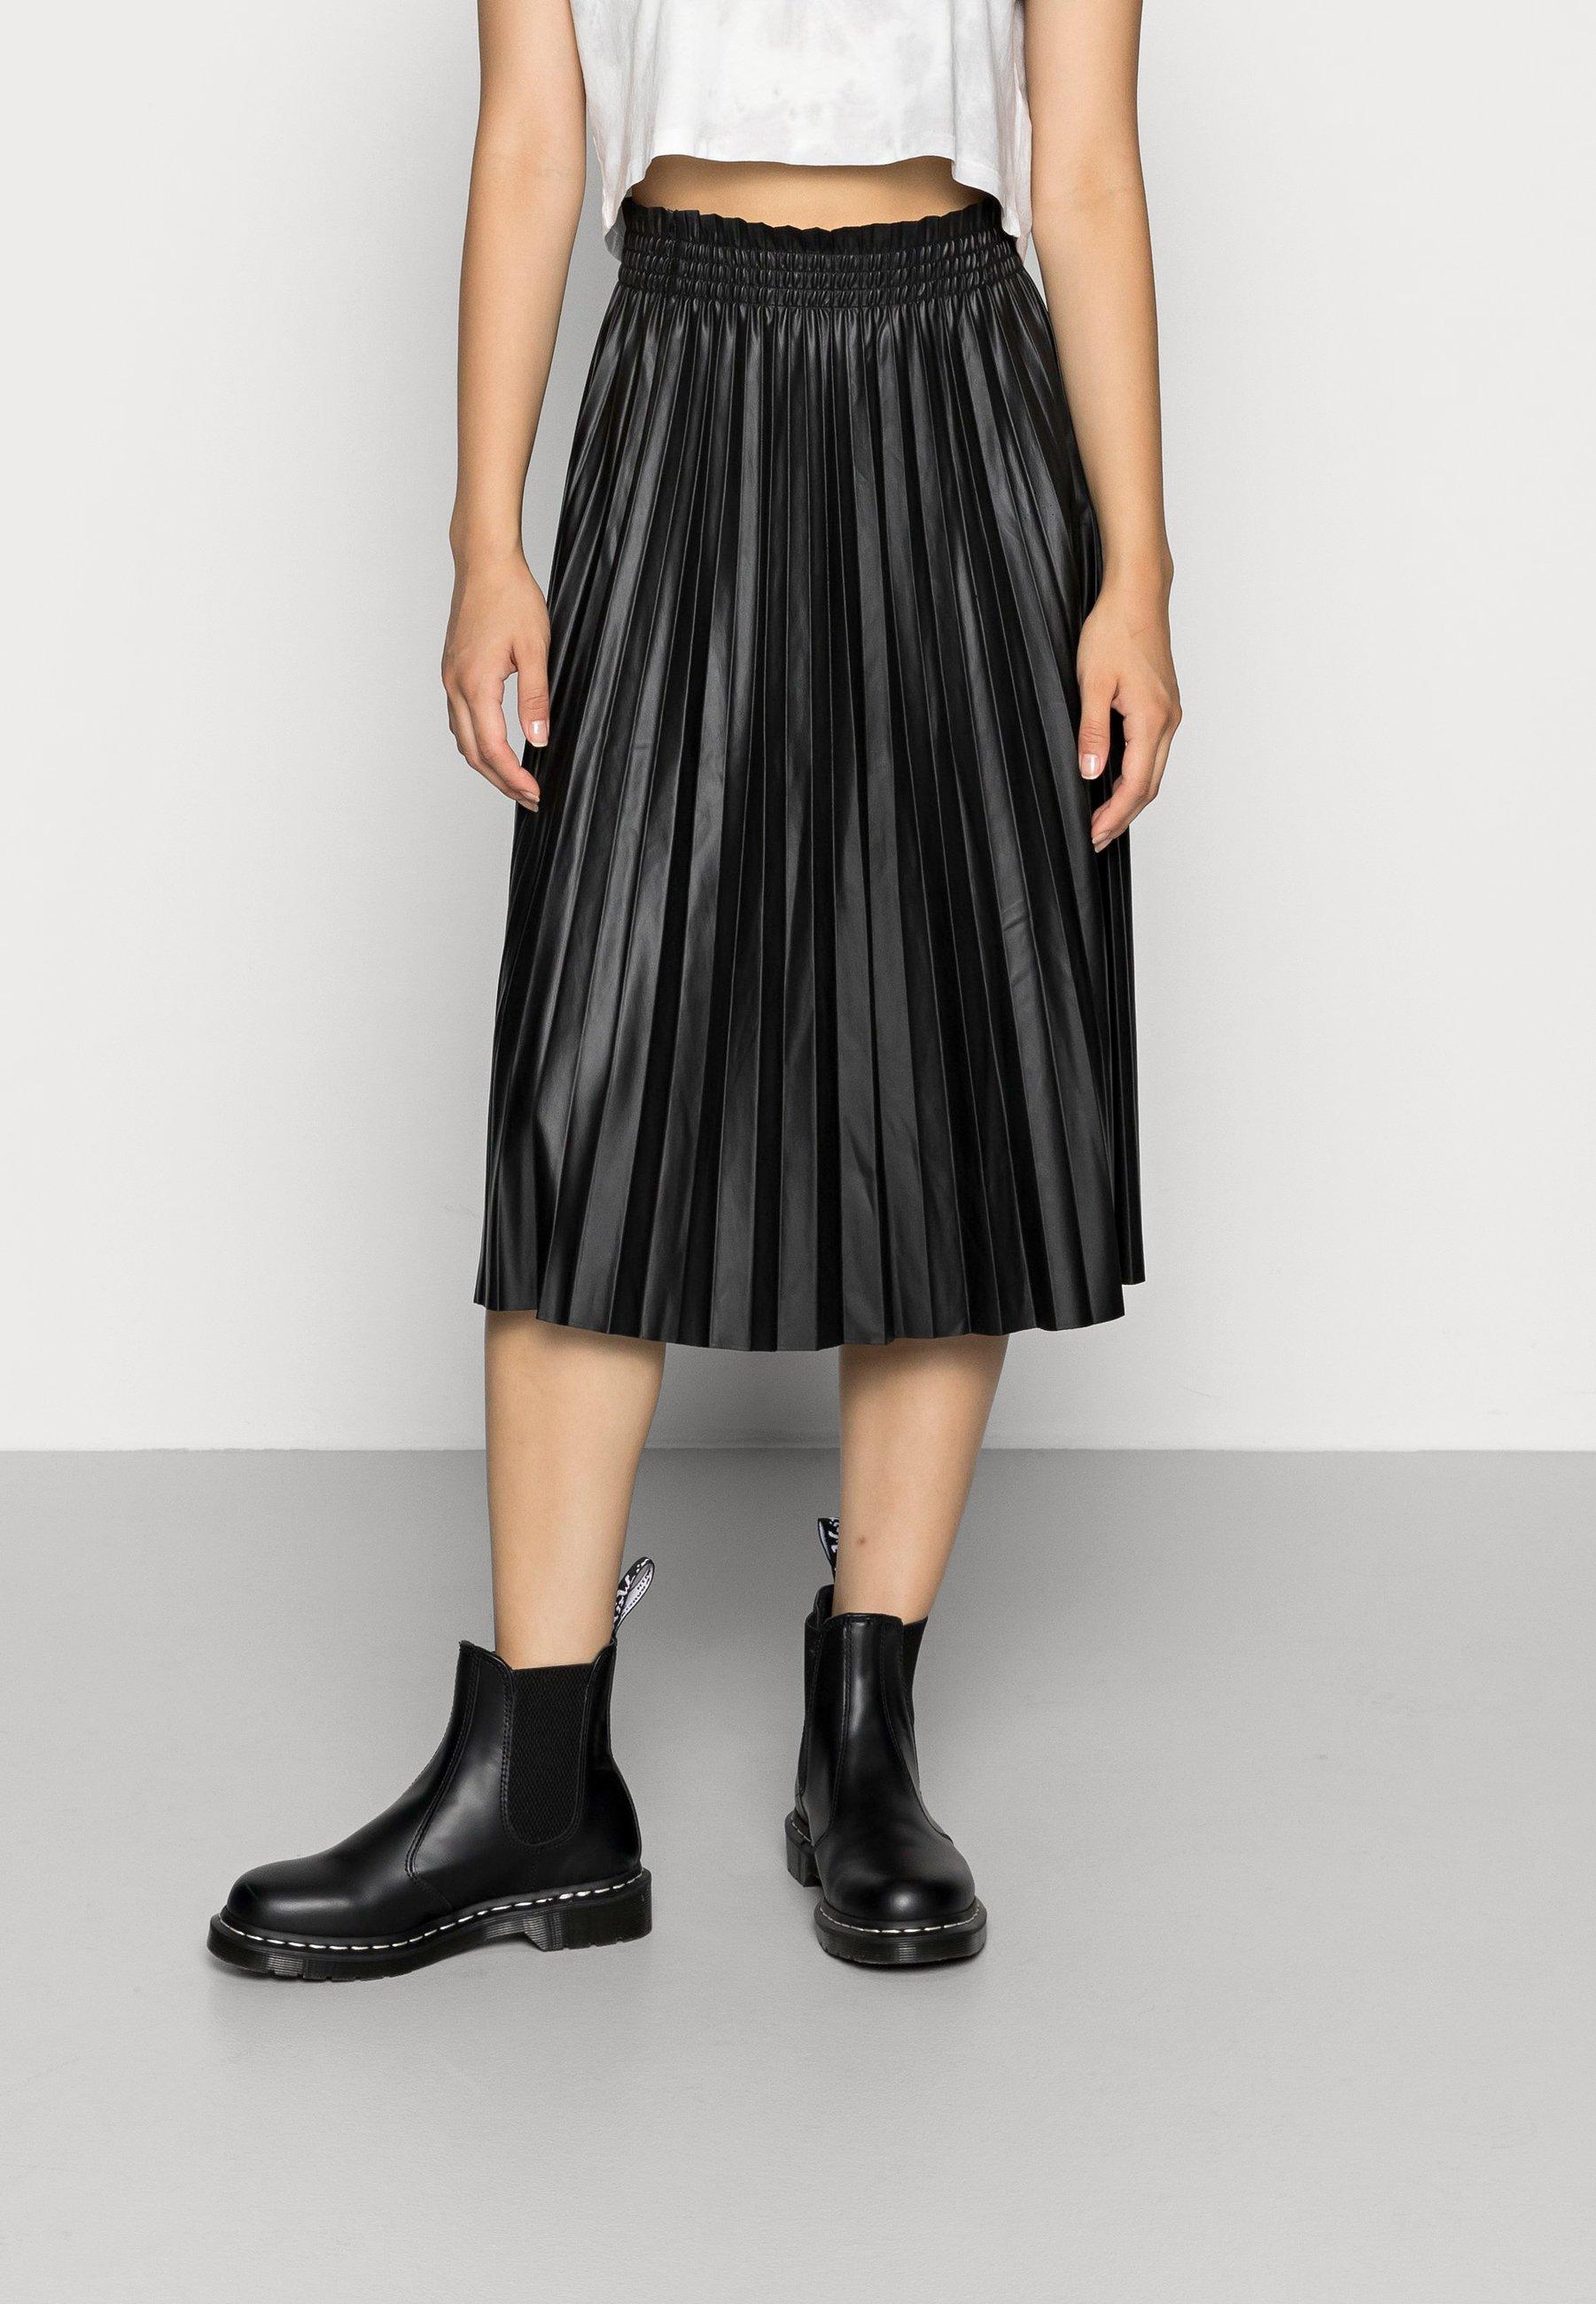 Femme VMNELLIE COATED CALF SKIRT - Jupe plissée